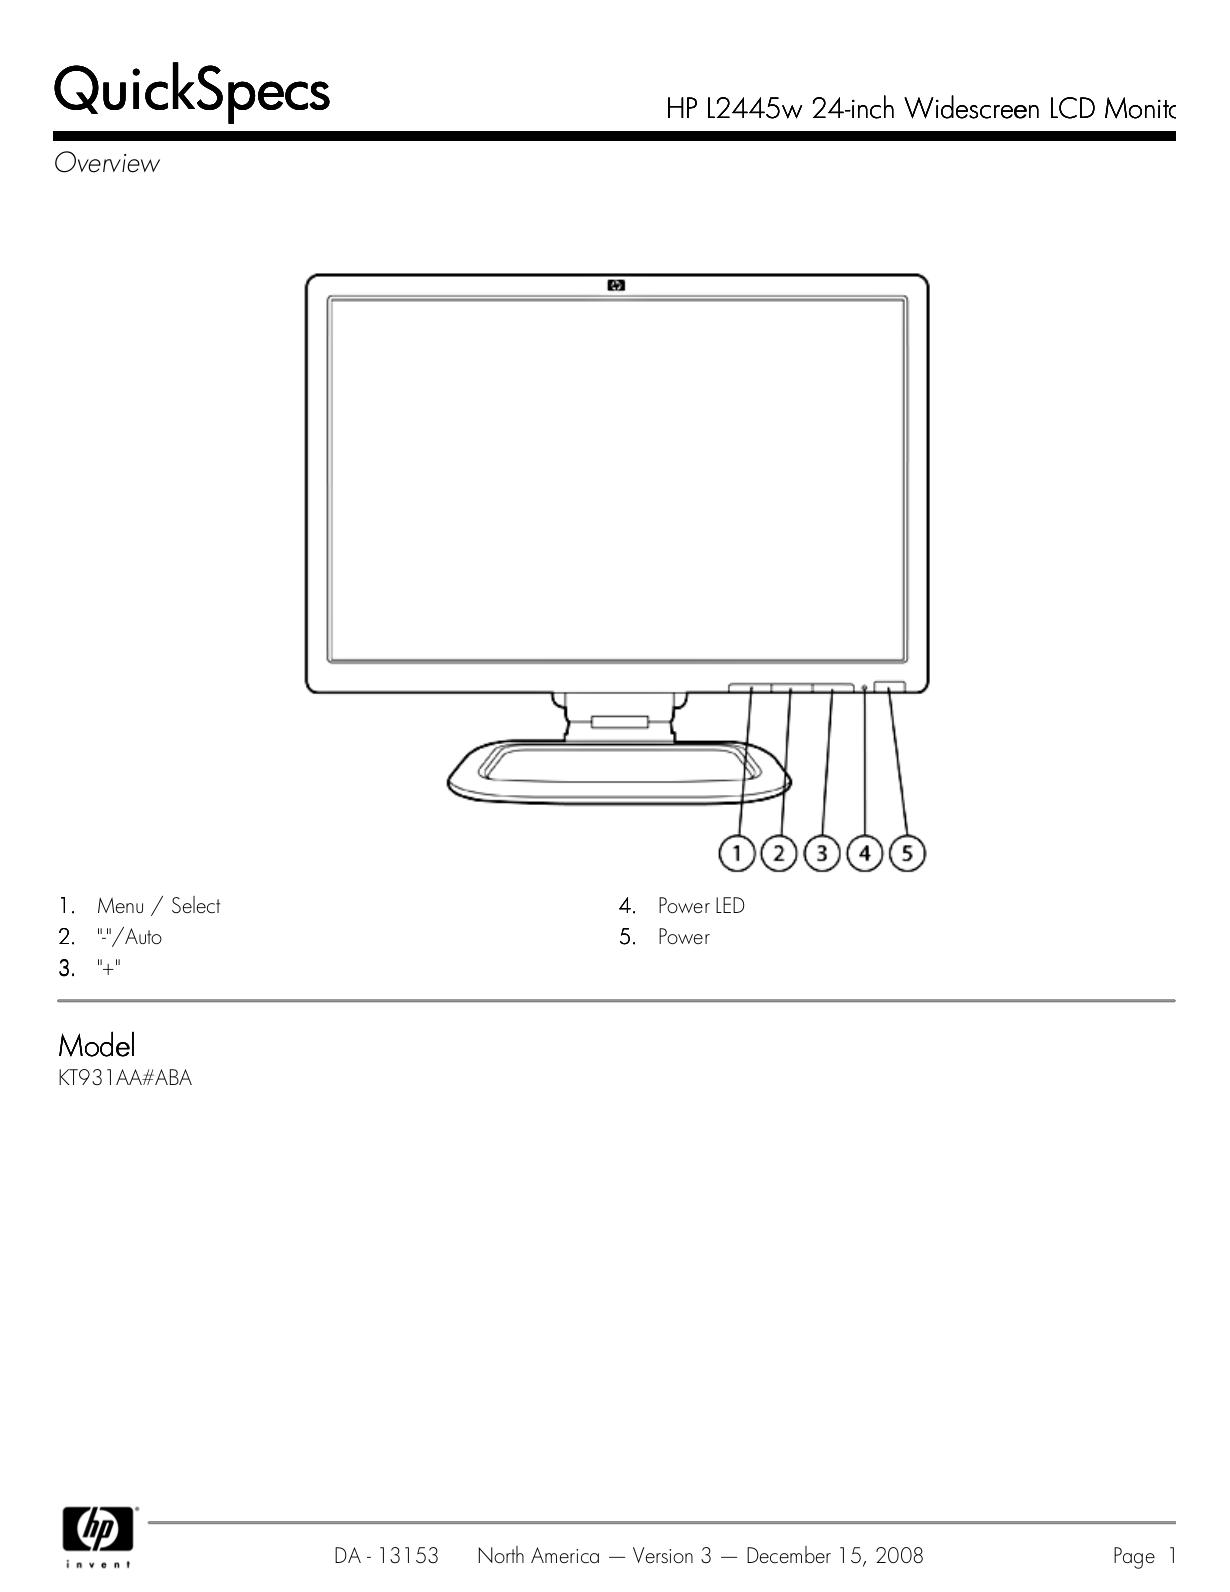 Hp l2445w 24 widescreen lcd monitor 1920x1200 wuxga, 1000:1.